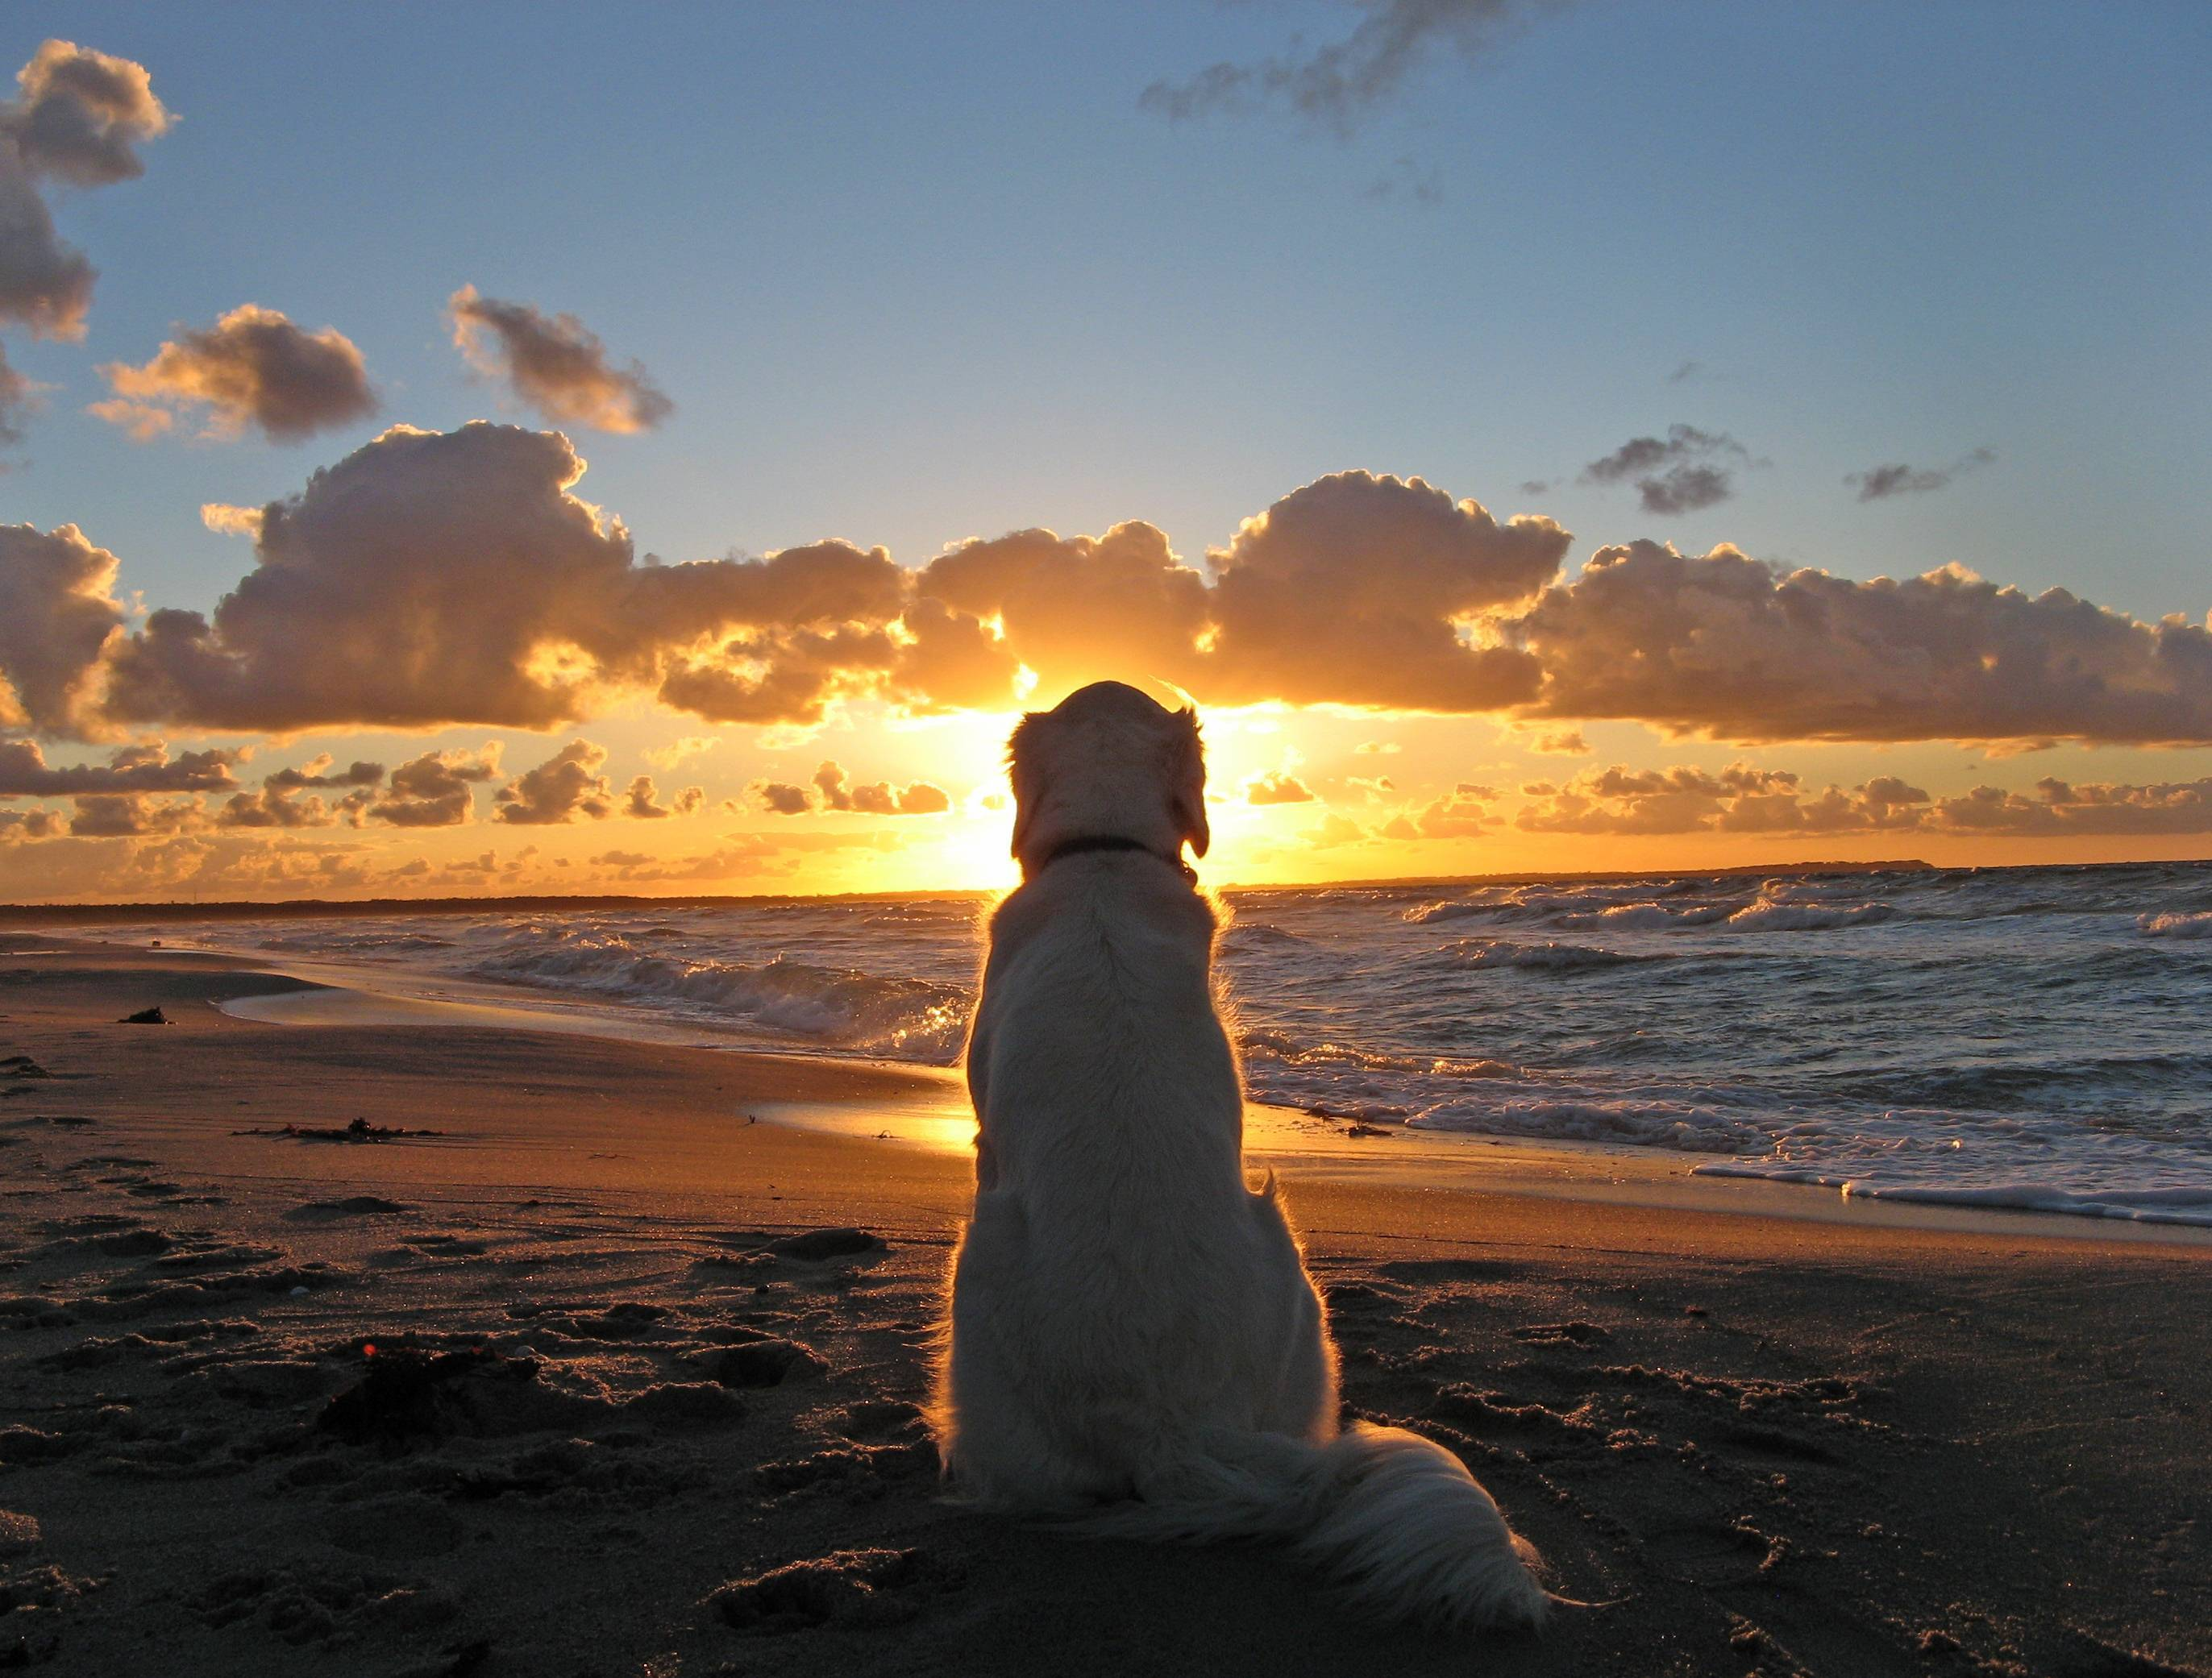 An old dog enjoying the sunset. - Imgur